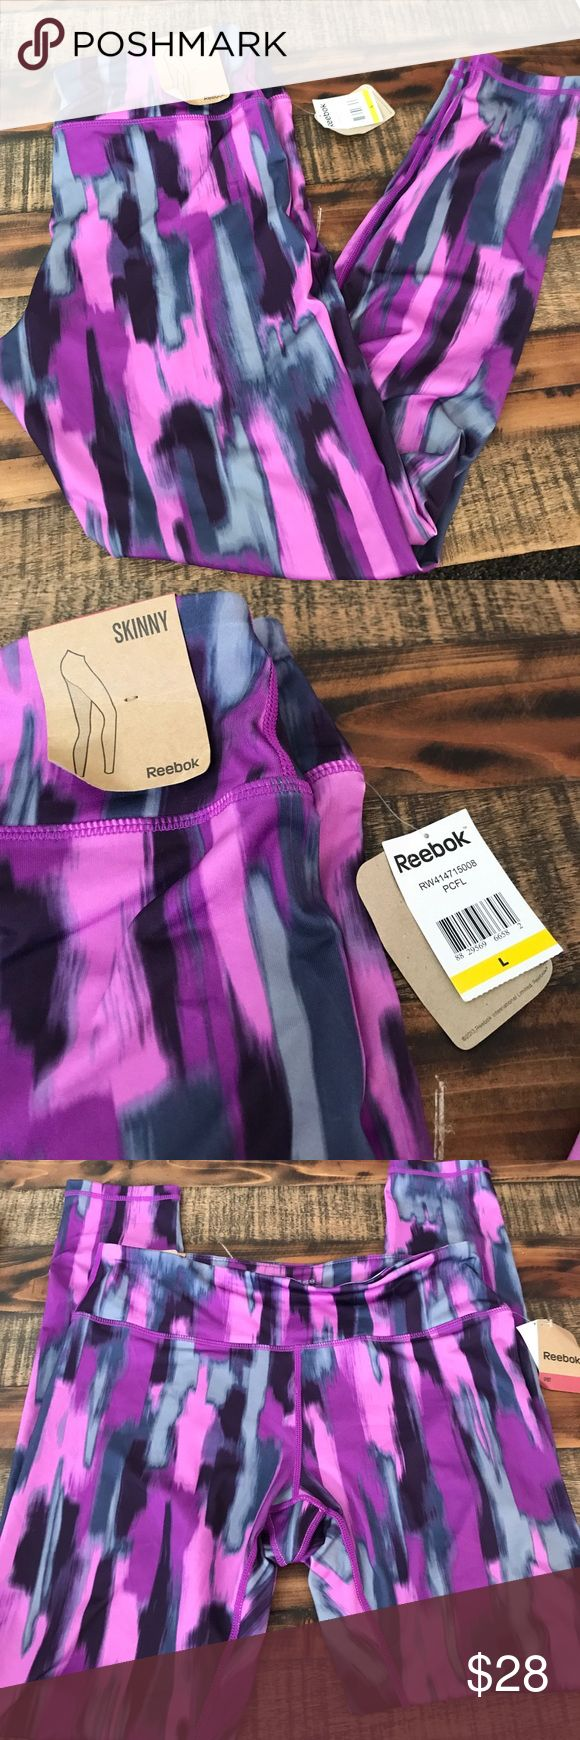 Reebok purple skinny workout leggings large Brand new with tags Reebok Pants Leggings